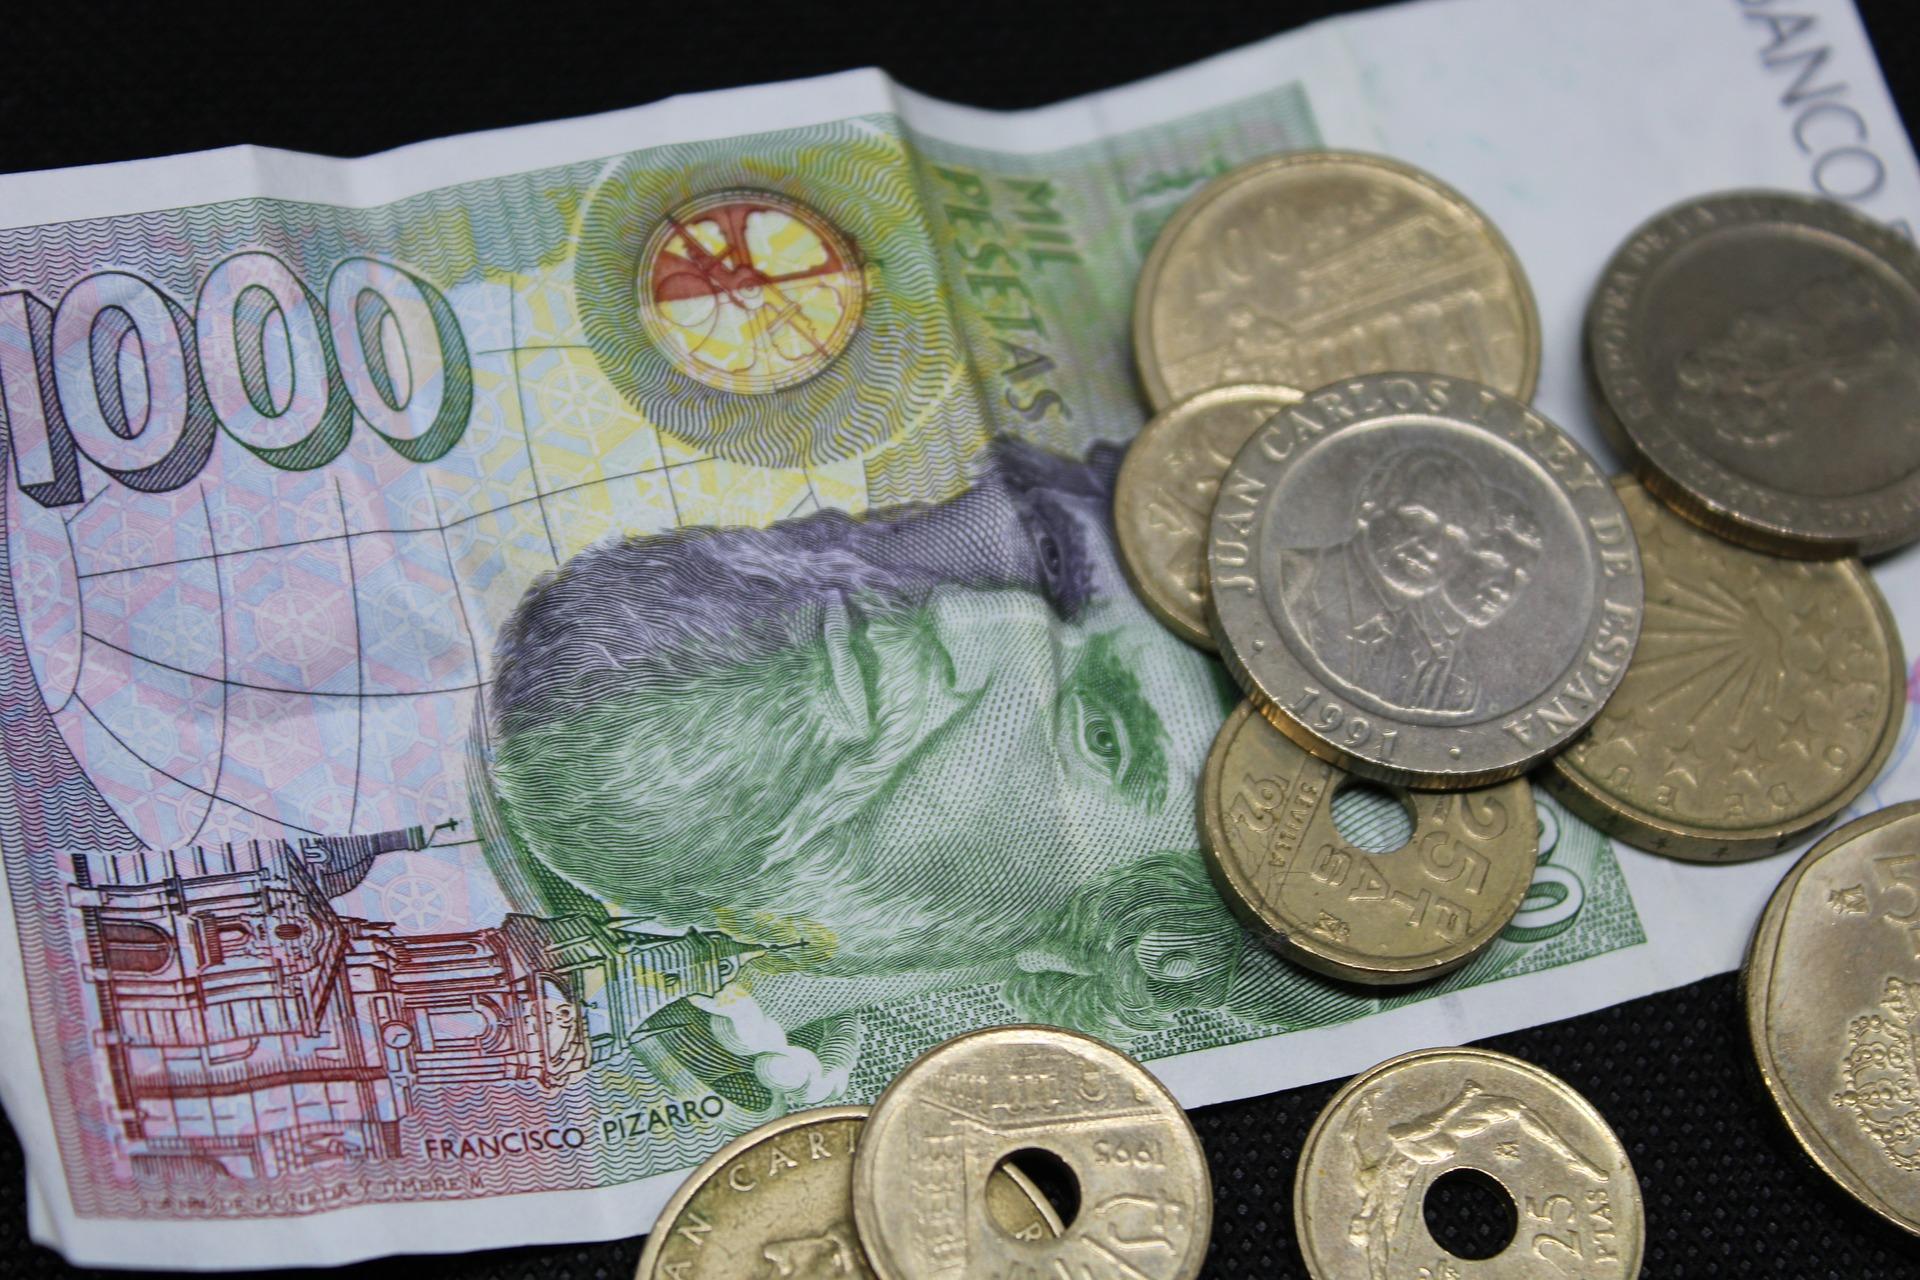 Cómo convertir pesetas a euros fácilmente